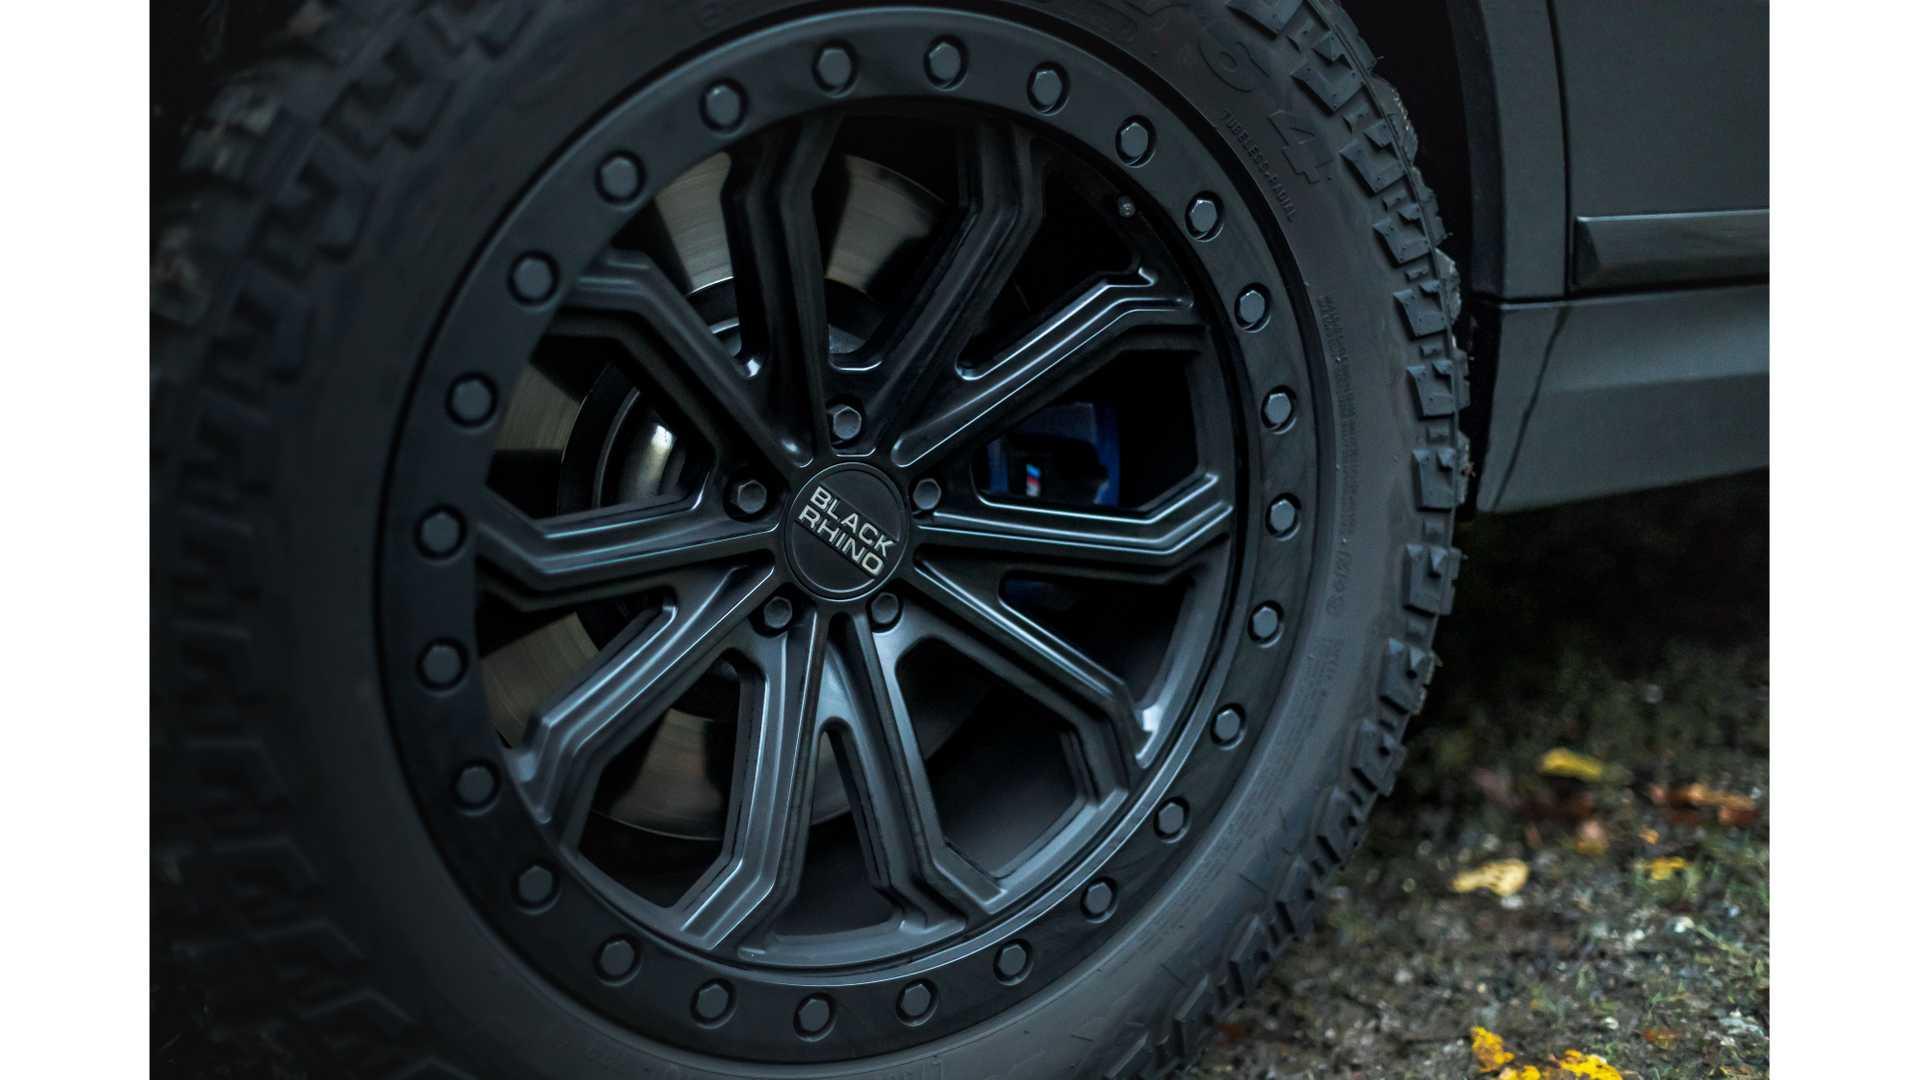 BMW-X7-Dirt-Edition-By-Manhart-11